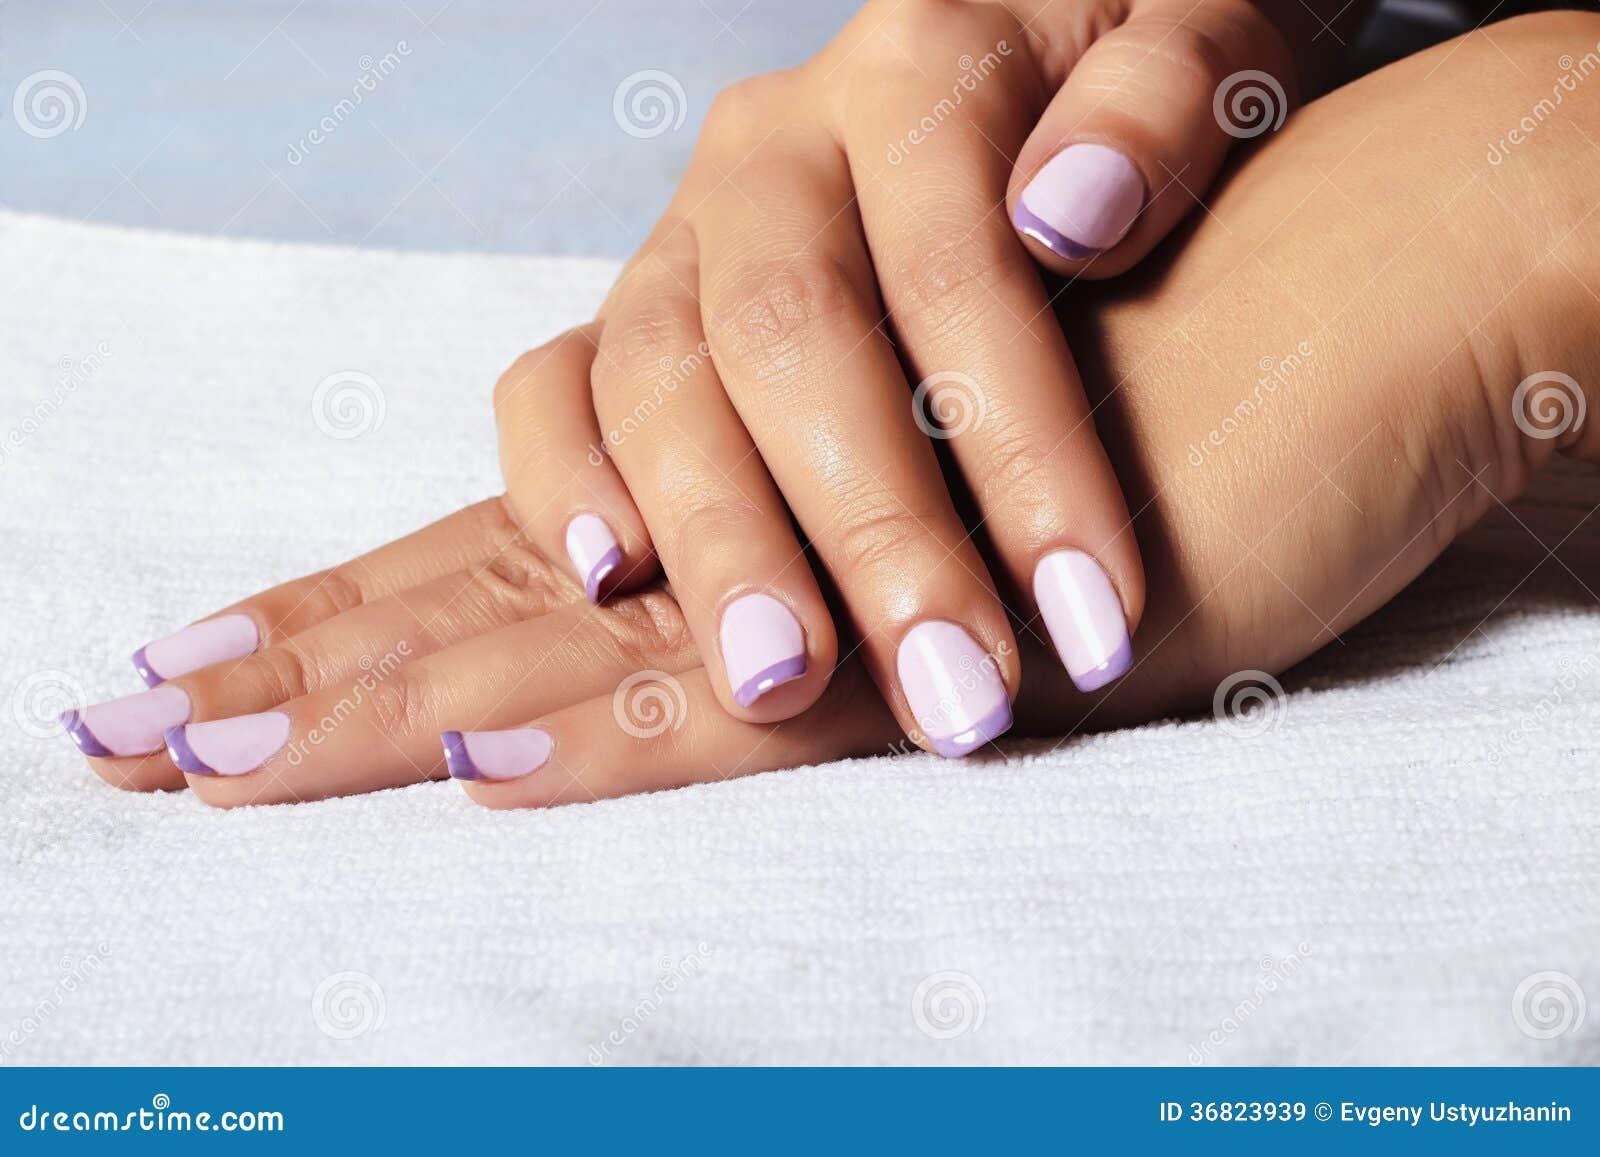 Manicure.female hands.beauty salon.shellac擦亮剂